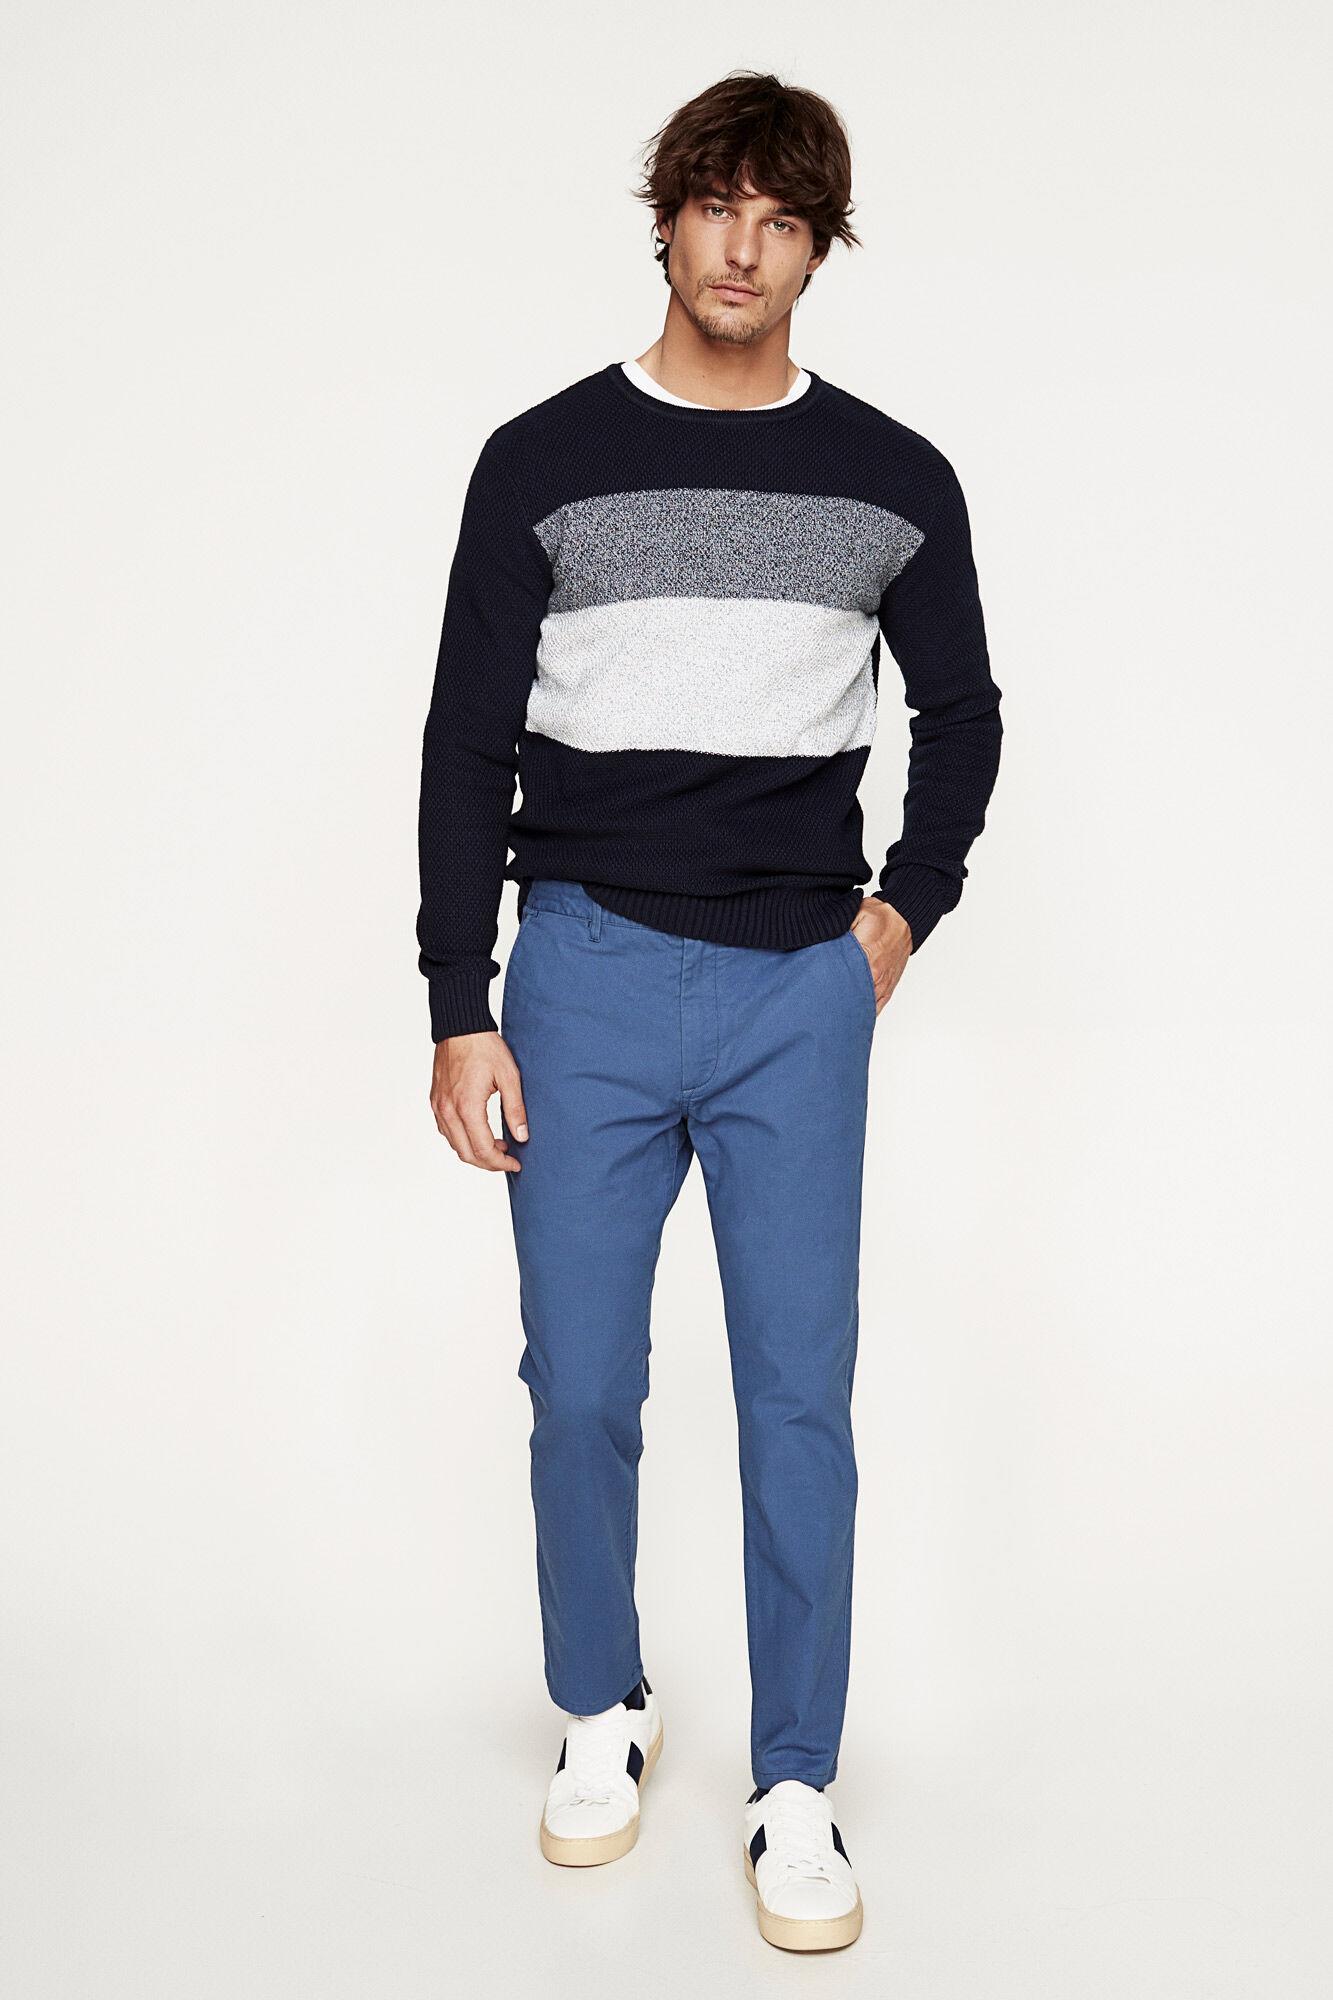 Mens Micro Chino Impression Pantalon Slim Springfield Xu4En6qX